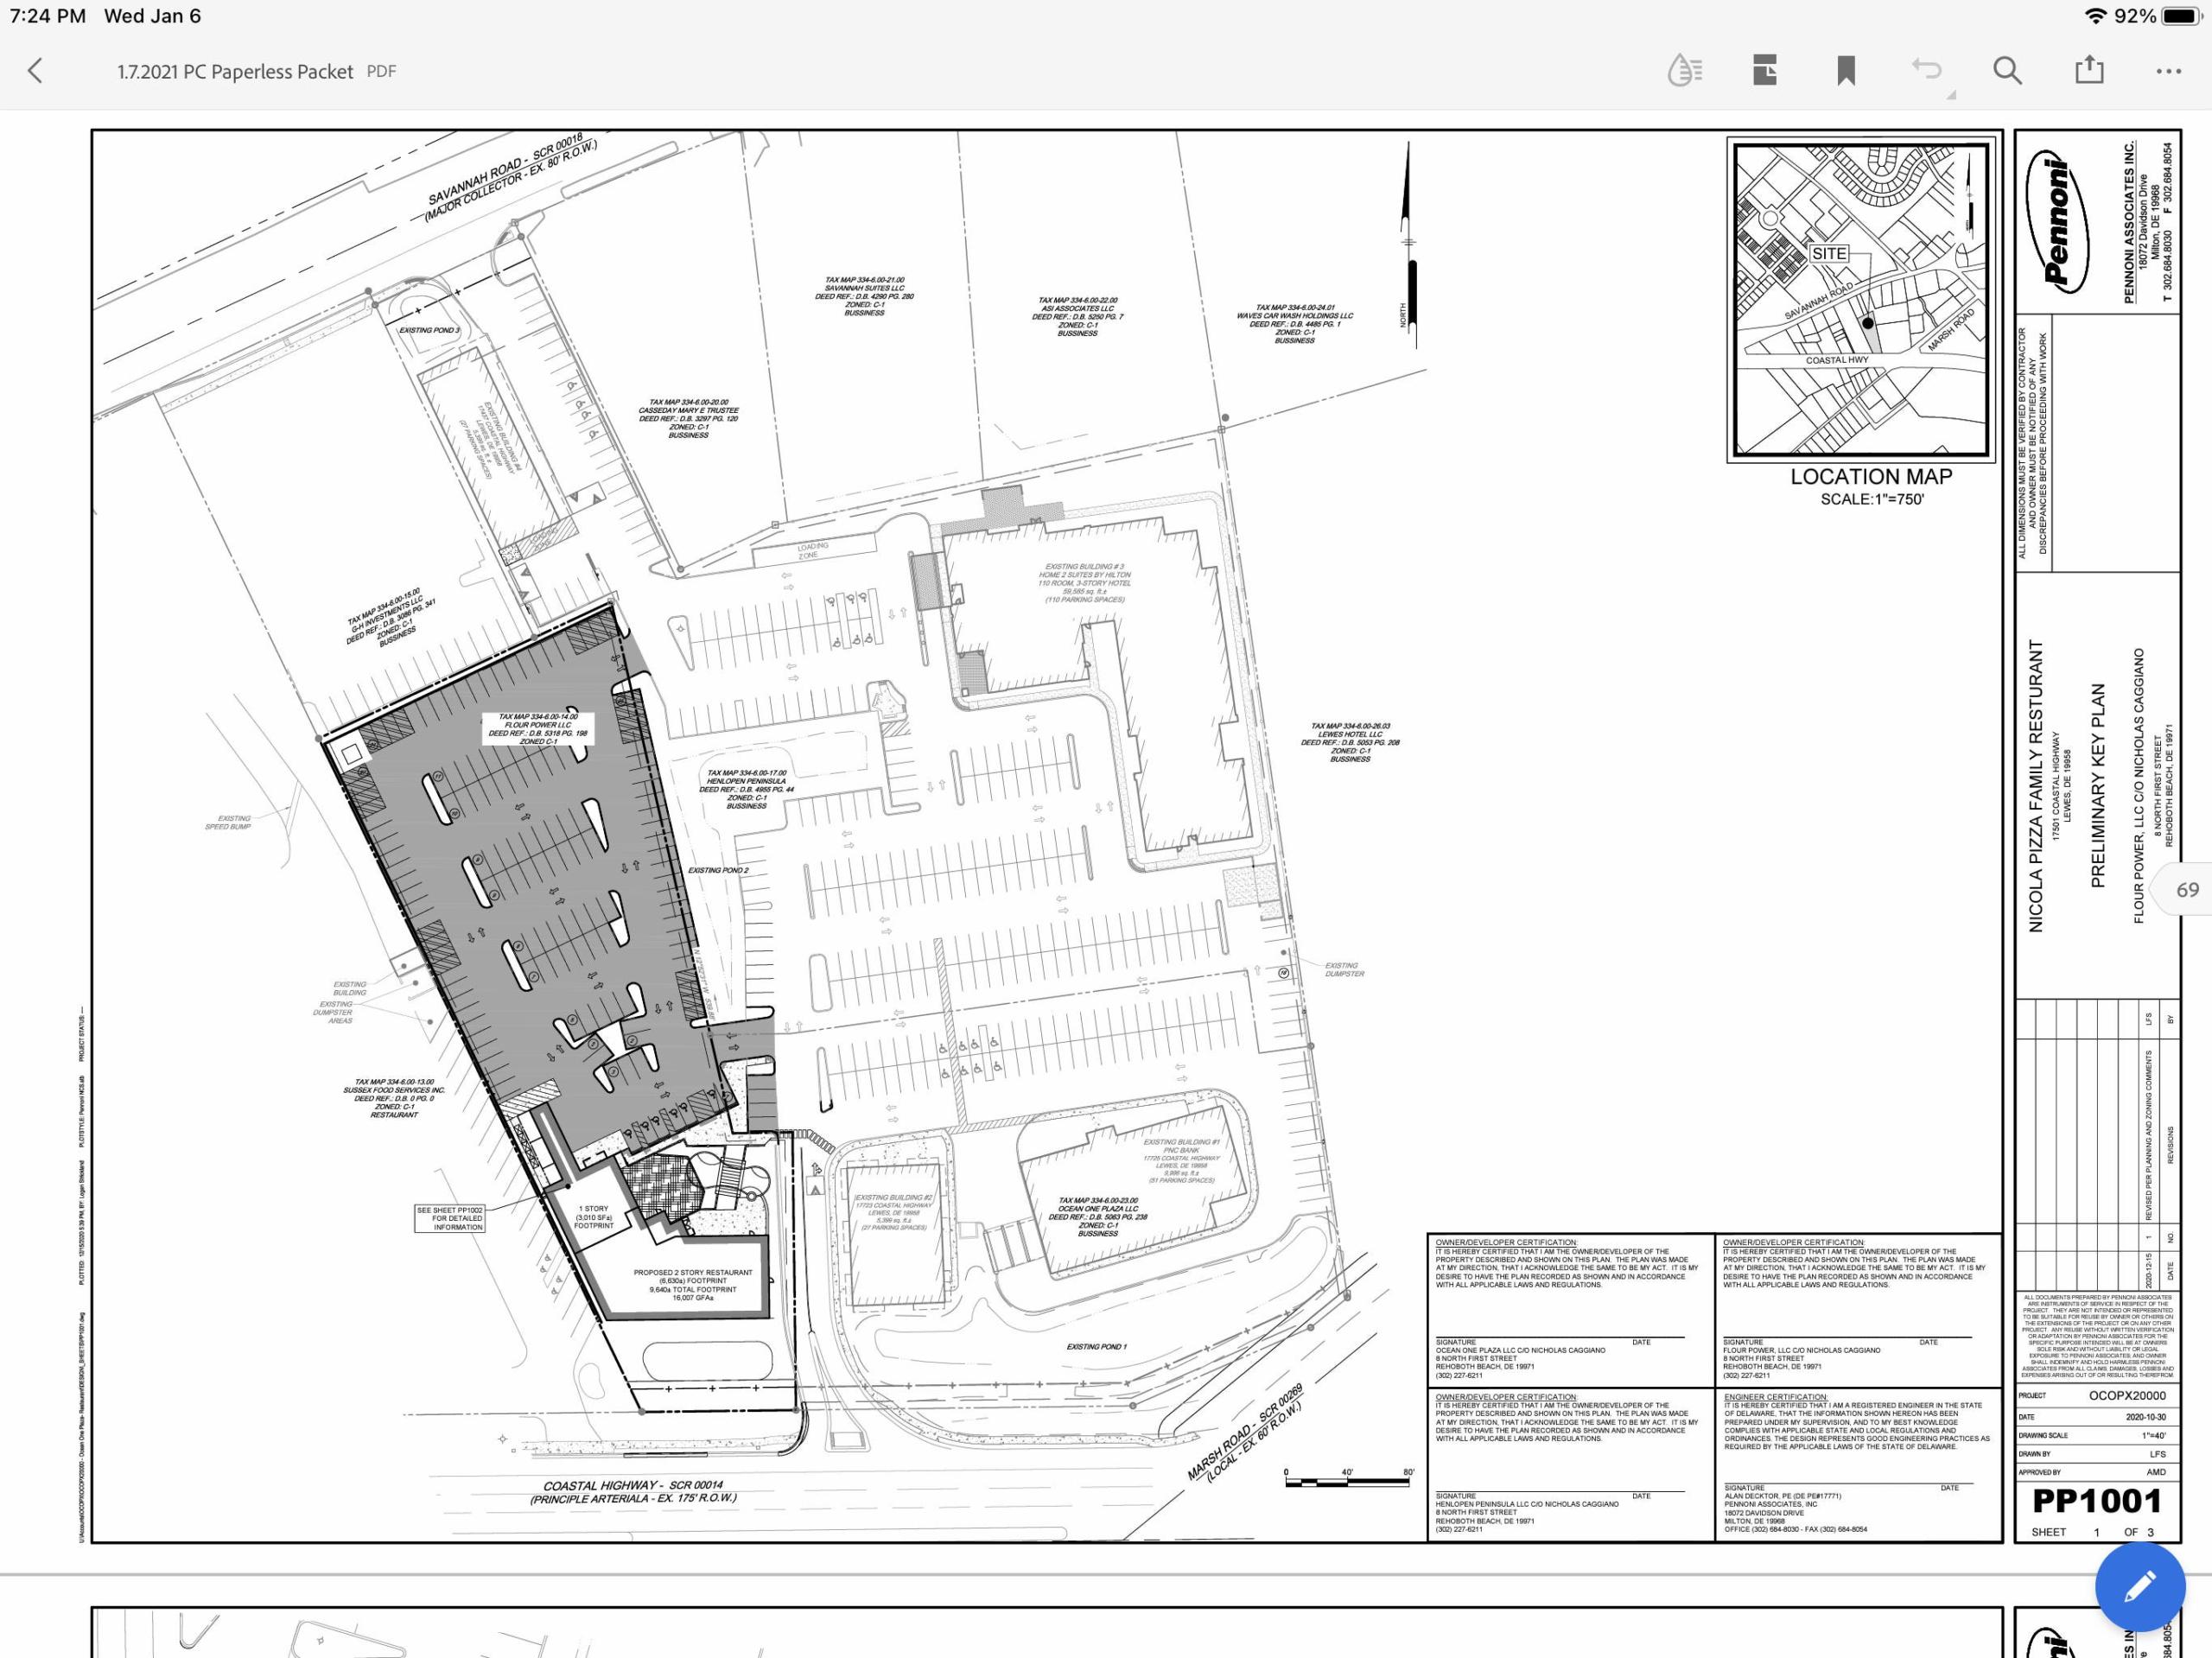 Nicola Pizza preliminary site plan in Lewes